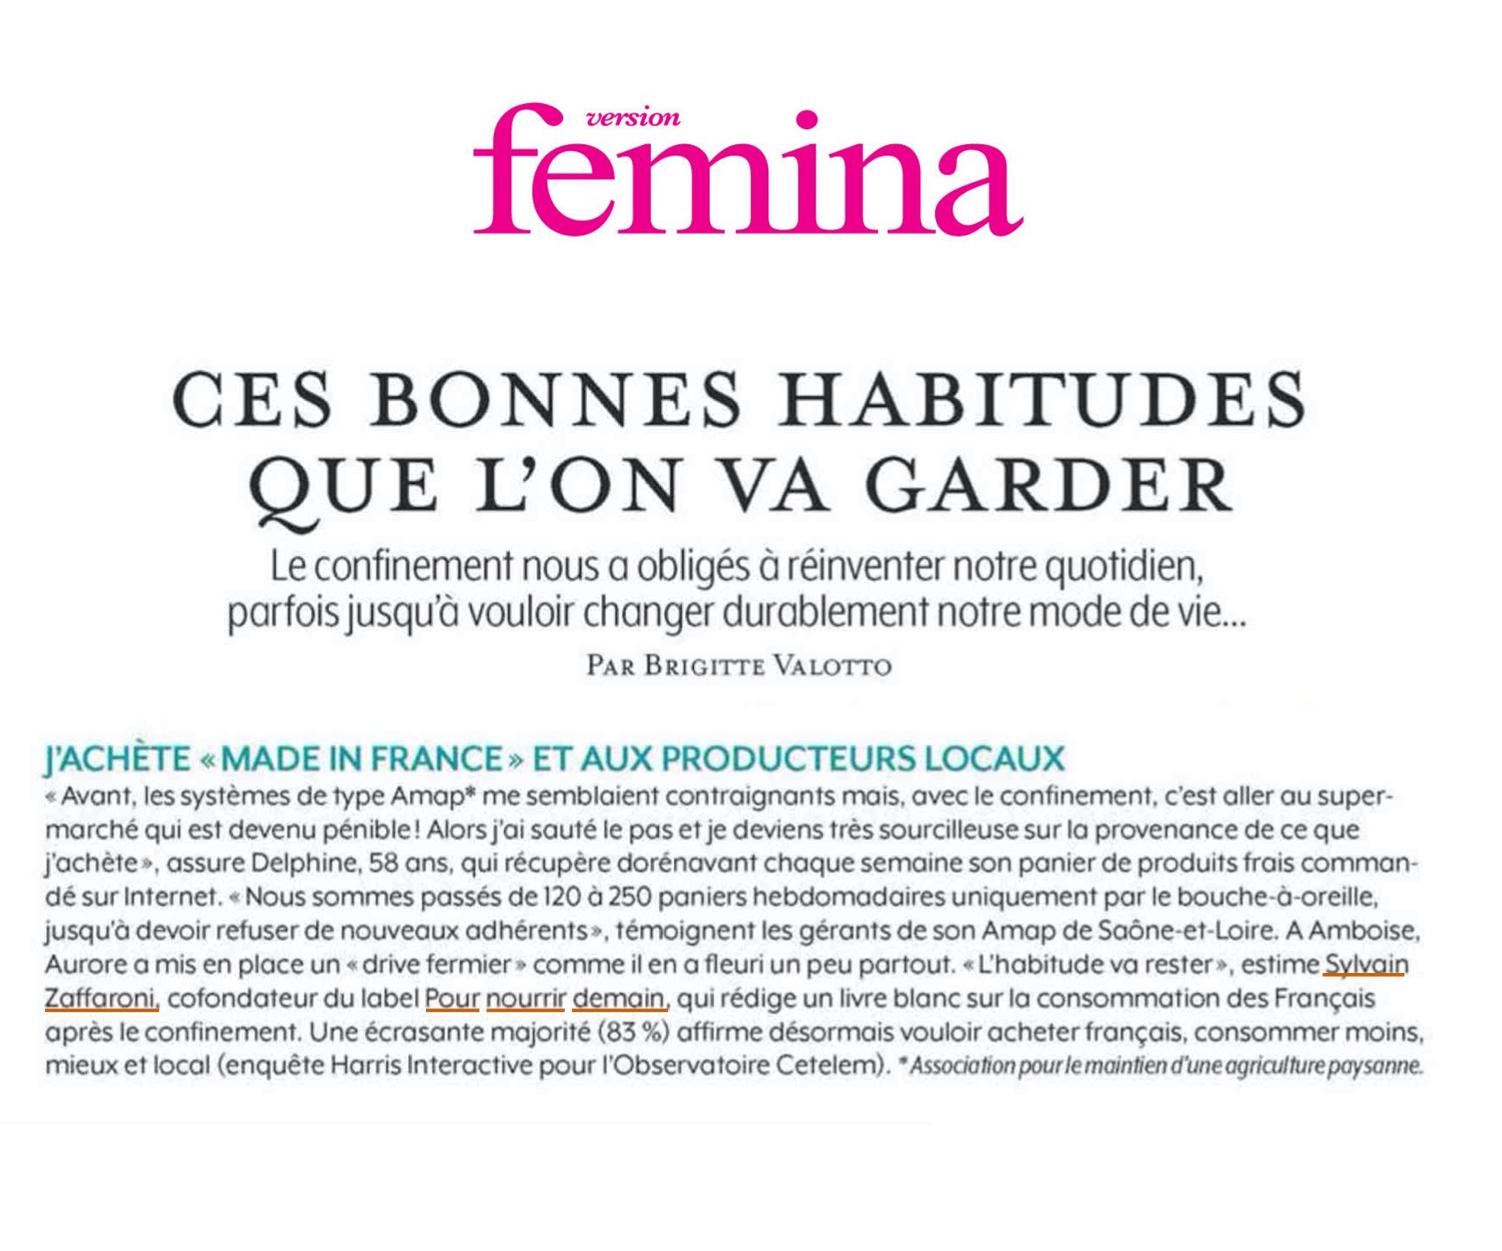 femina - Intervention dans le magazine Version Femina